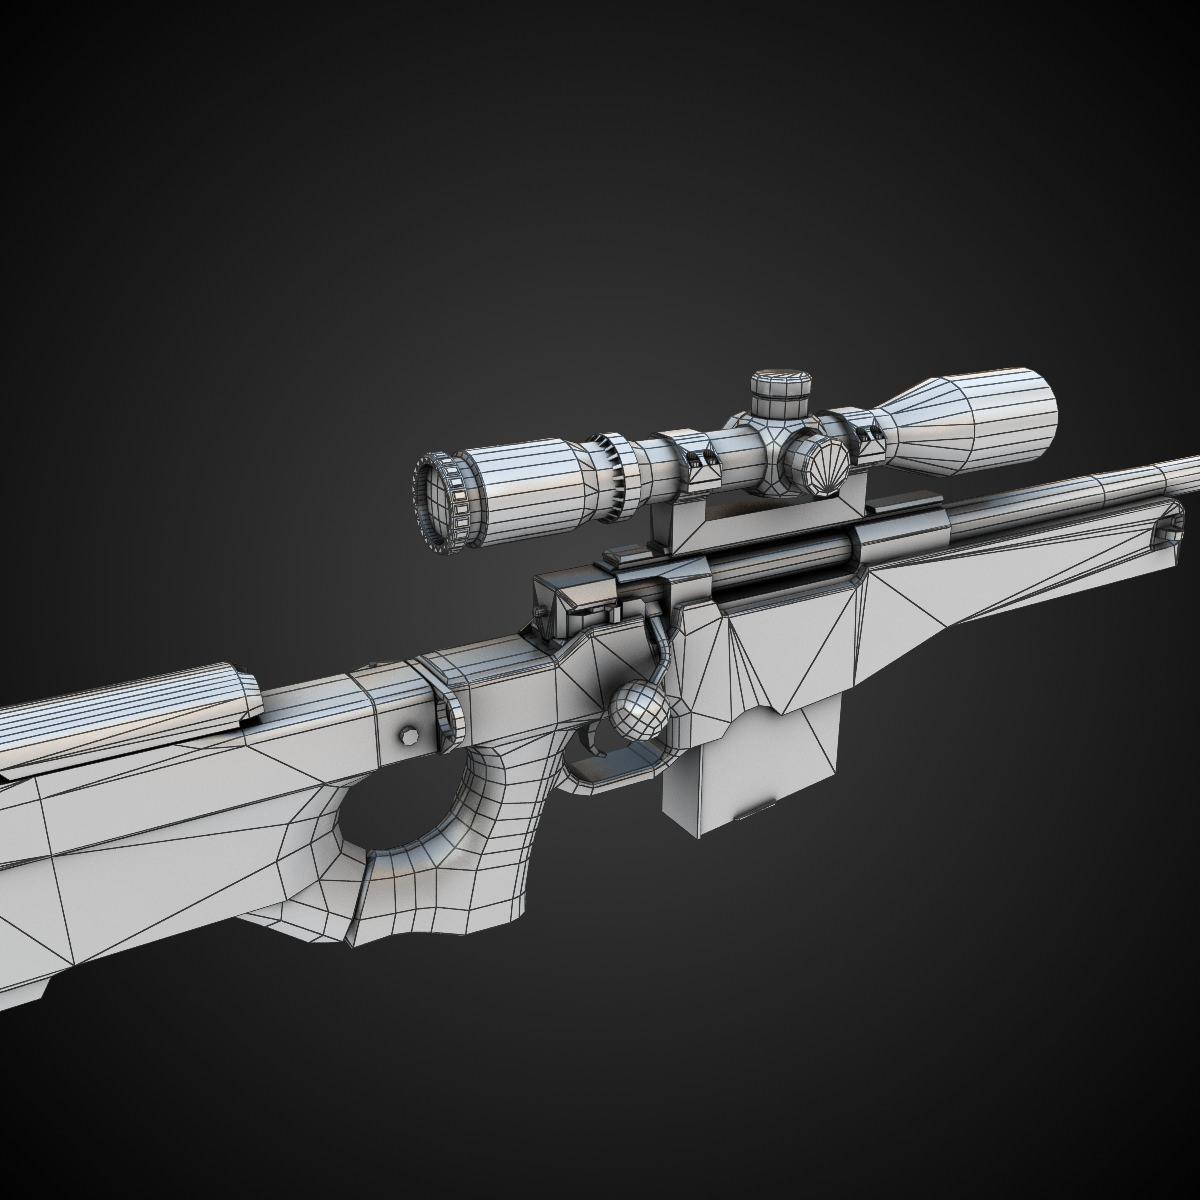 AWM Sniper Rifle 3D Model Game Ready Max Obj Fbx Lwo